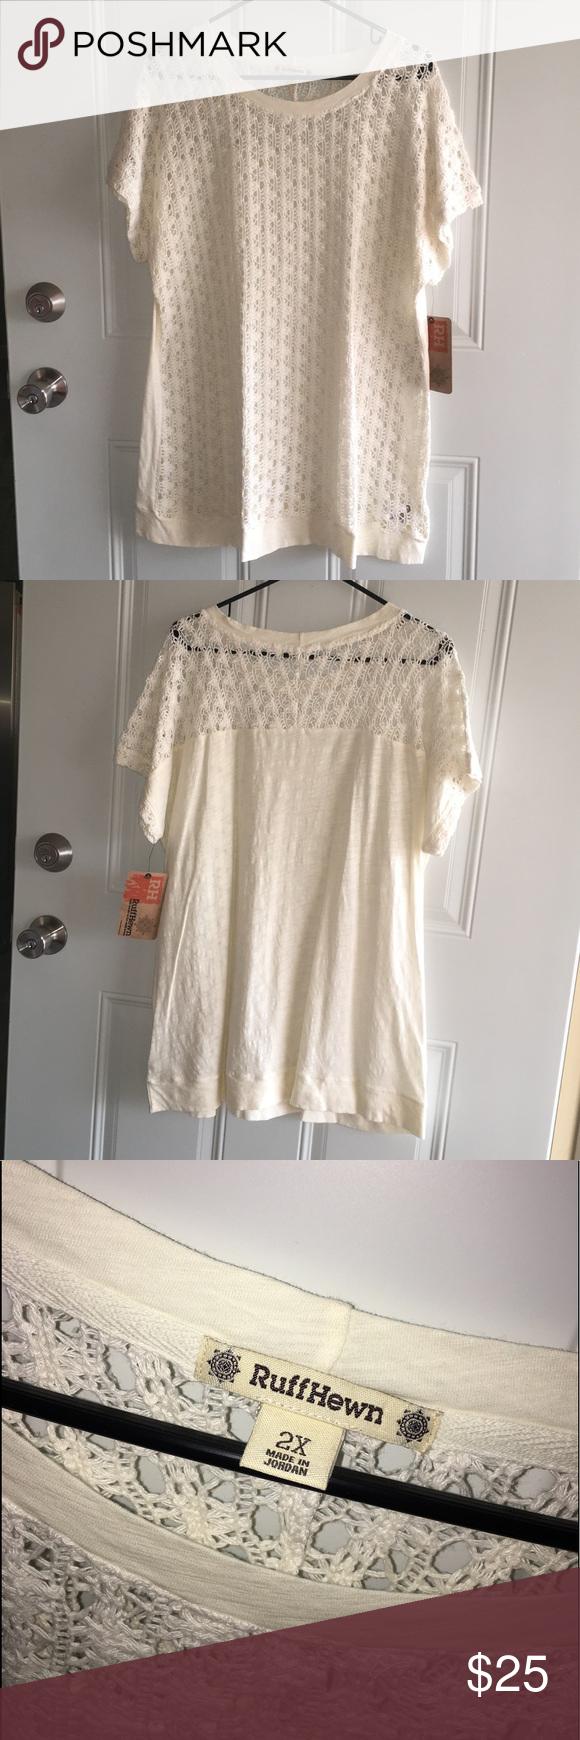 Vintage white transparent lace short sleeve shirt.